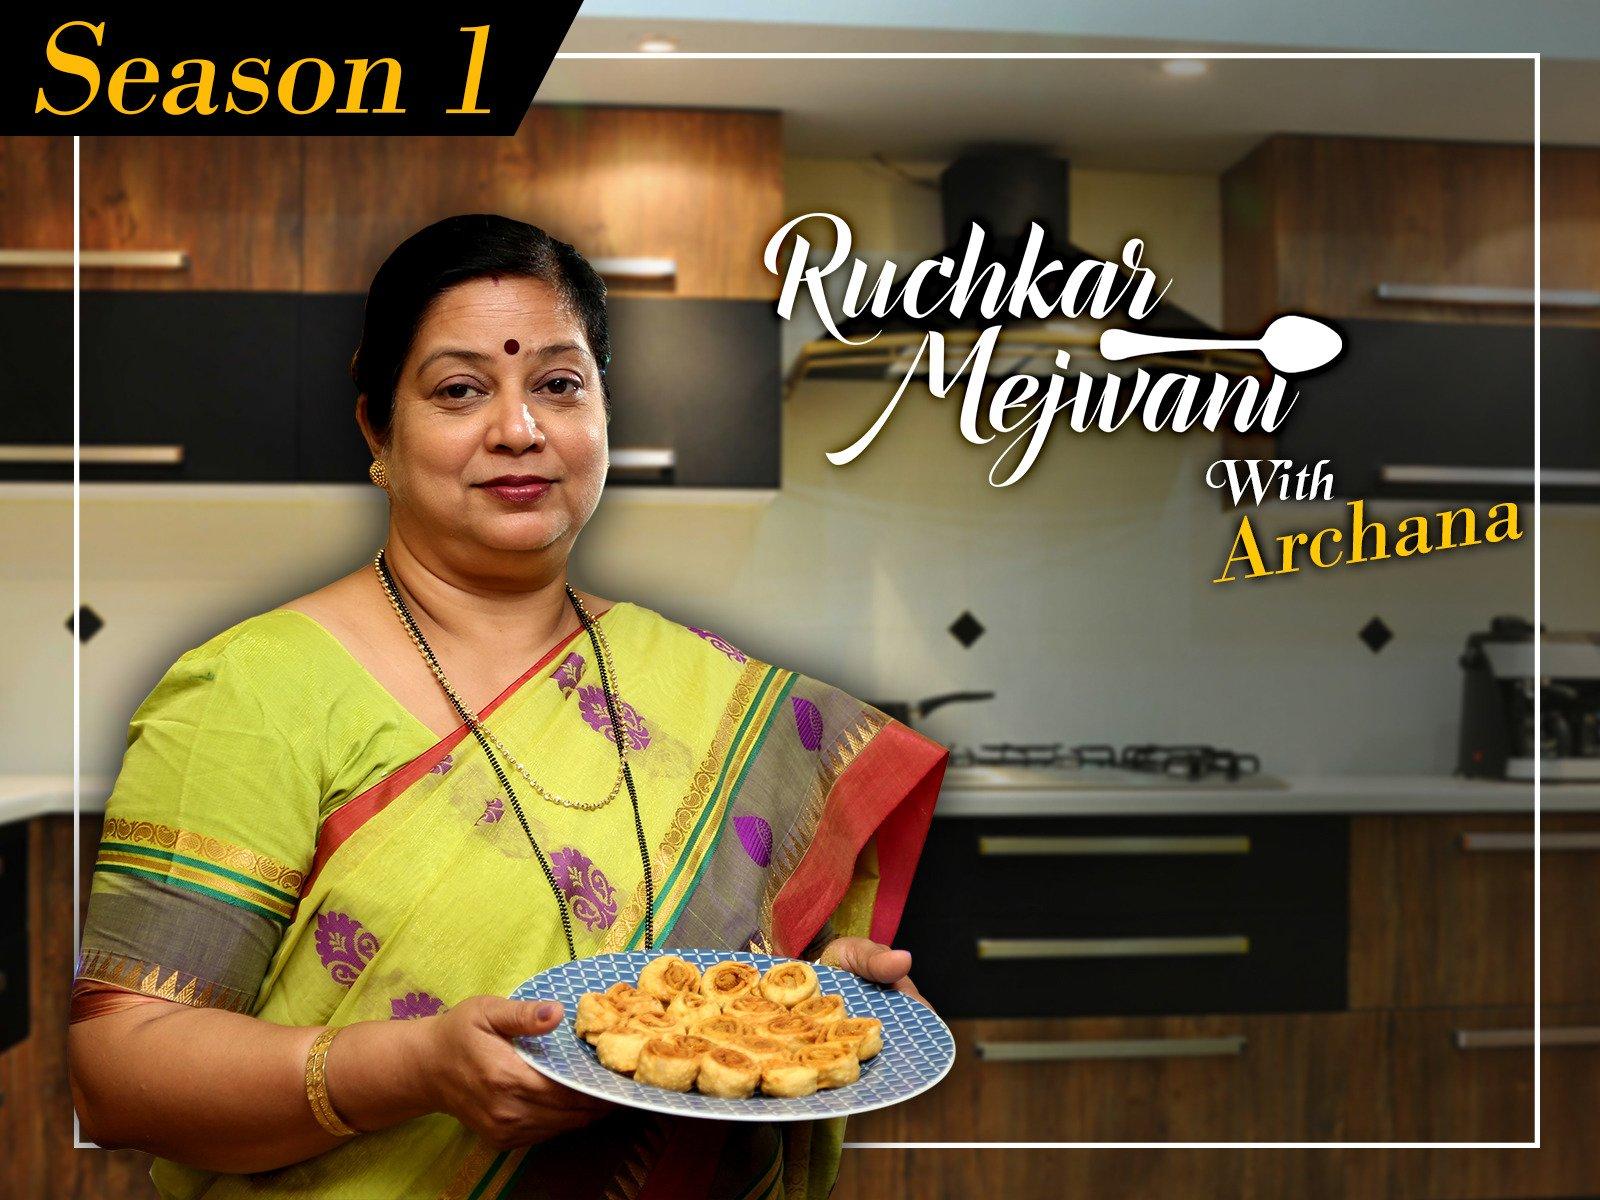 Clip: Ruchkar Mejwani with Archana - Season 1